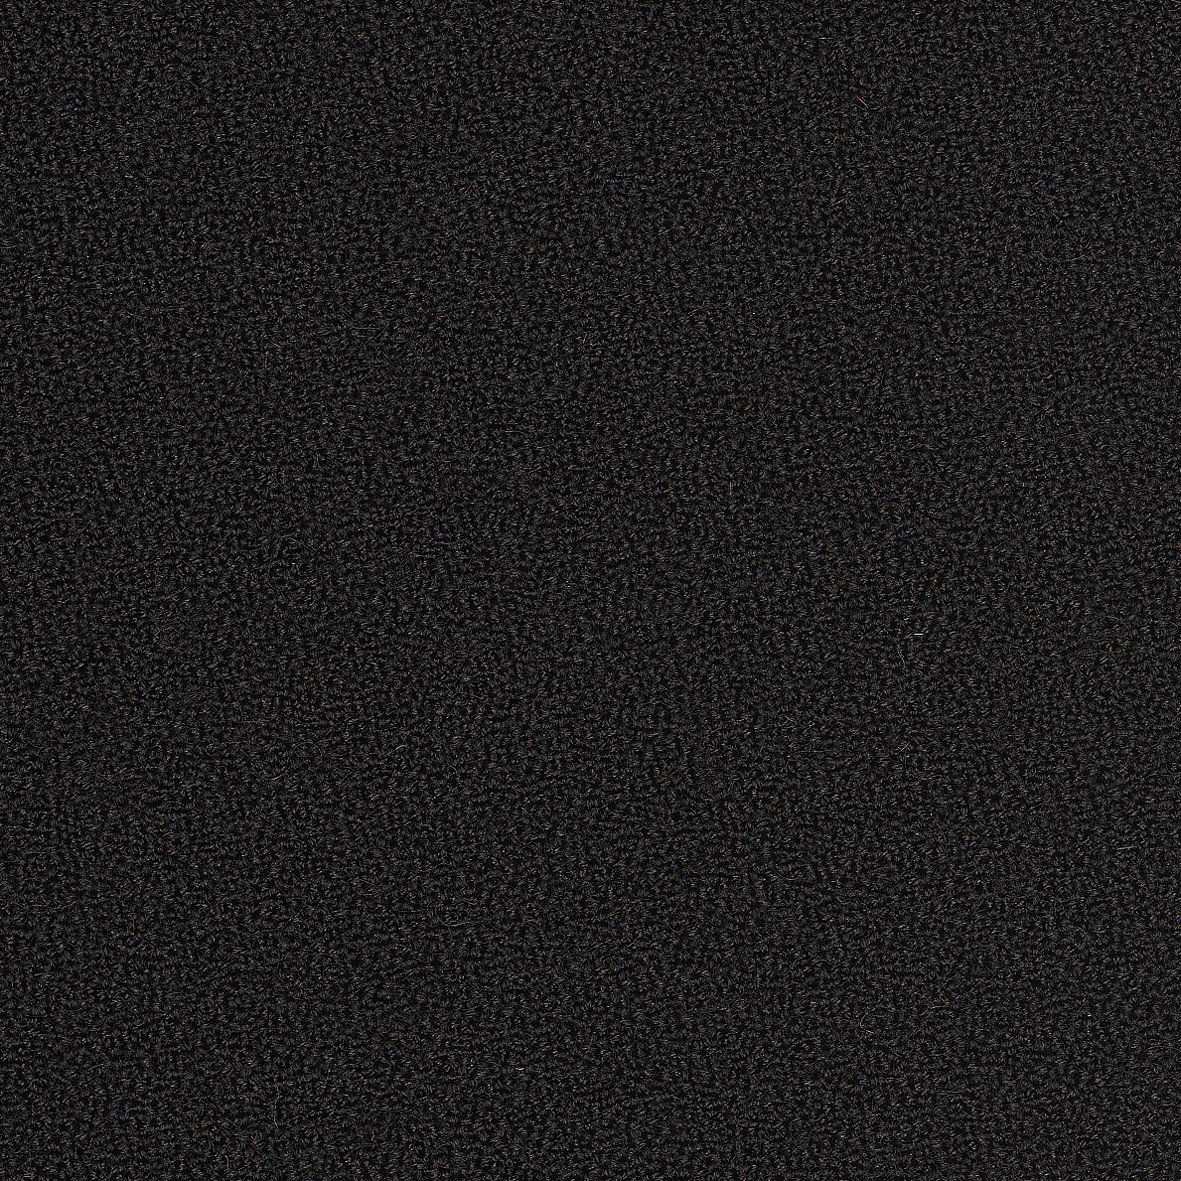 Softline bordskærmvæg sort B800xH450 mm